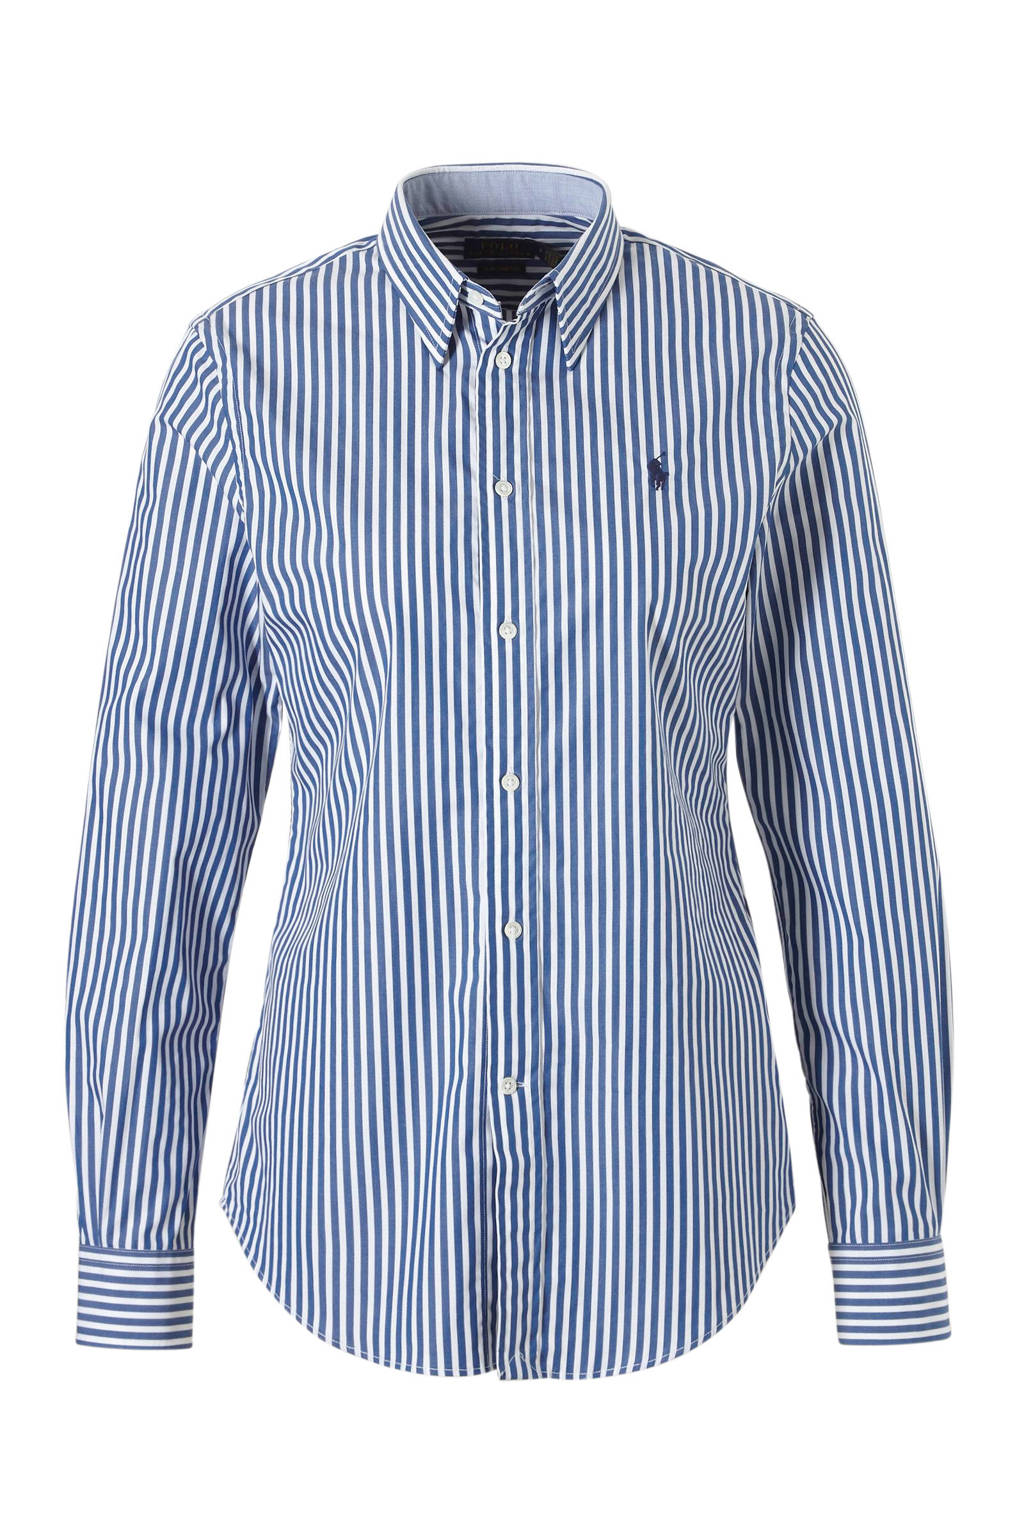 POLO Ralph Lauren streepte blouse blauw, Blauw